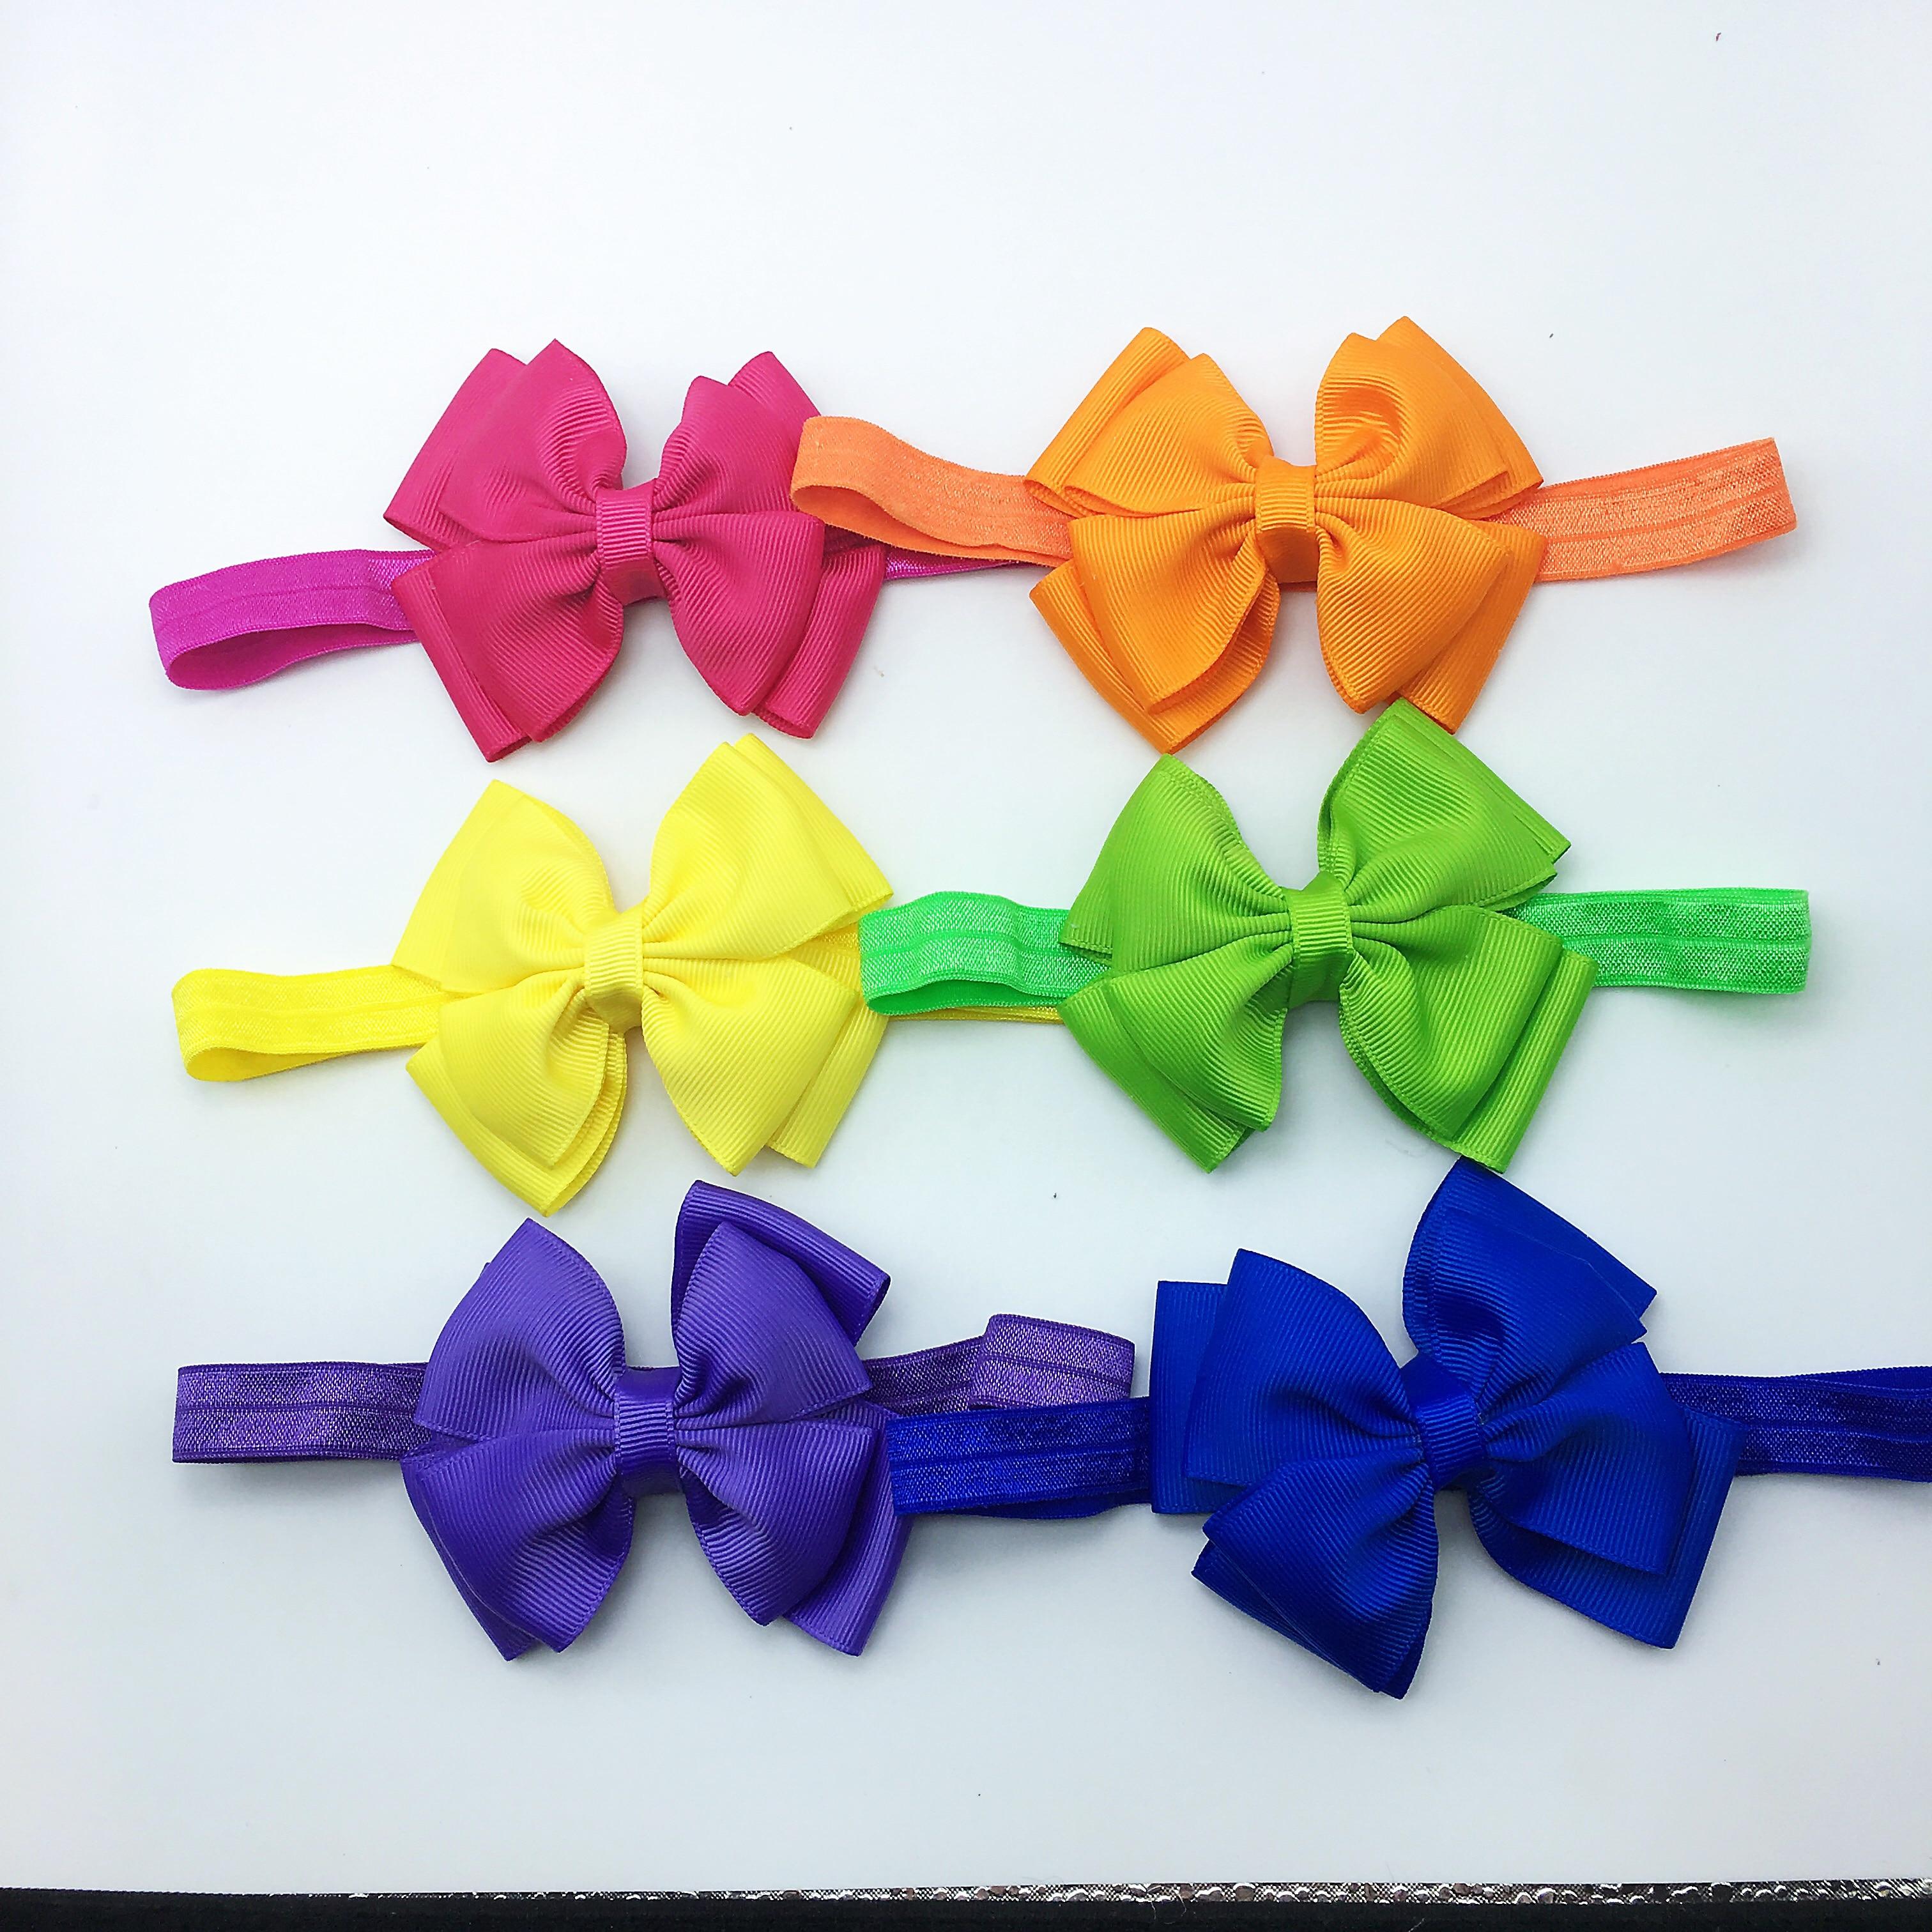 10 PCS Small Cute Bow Tie Headband Bow-knot Ribbon Elastic Hair Bands Accessories